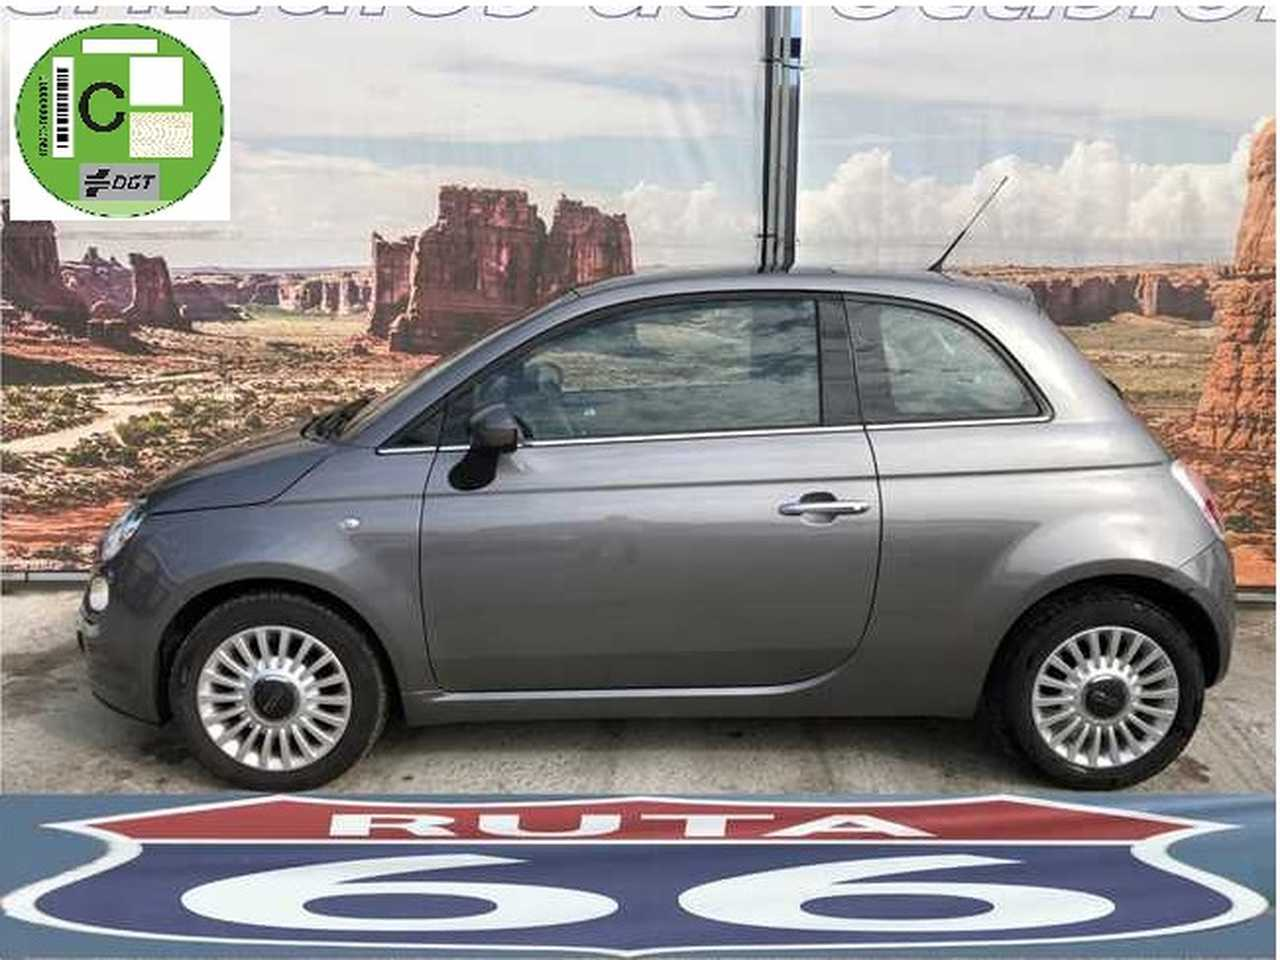 Fiat 500 1.2 8v 69 CV Lounge 3p   - Foto 1